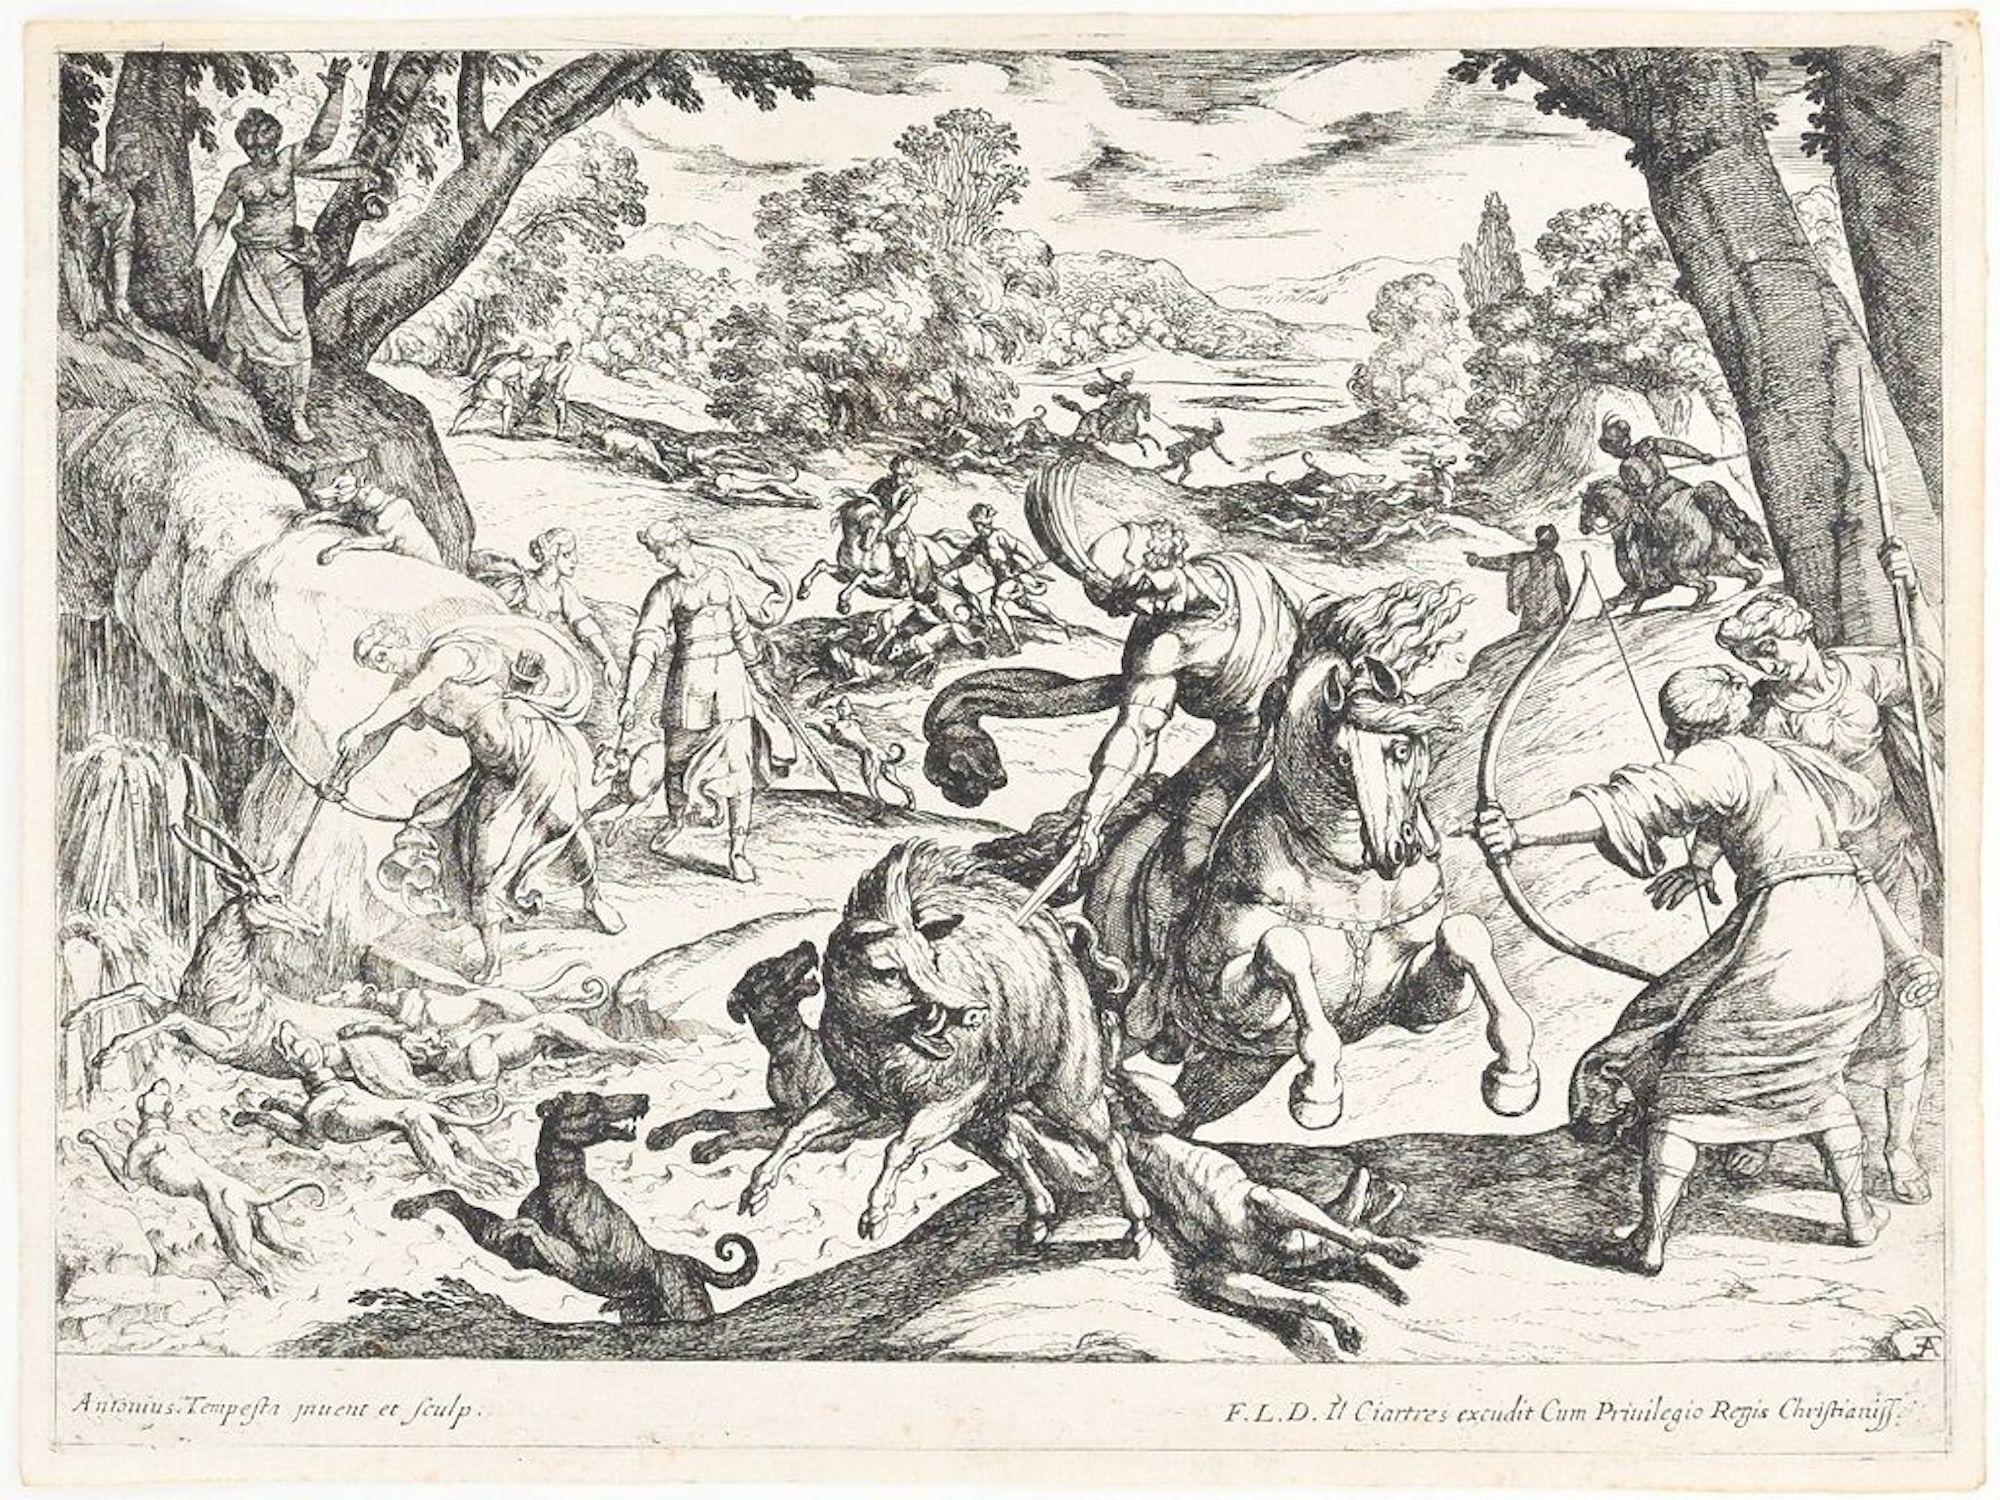 Hunting Scene - Original Etching by Antonio Tempesta - Early 17th Century